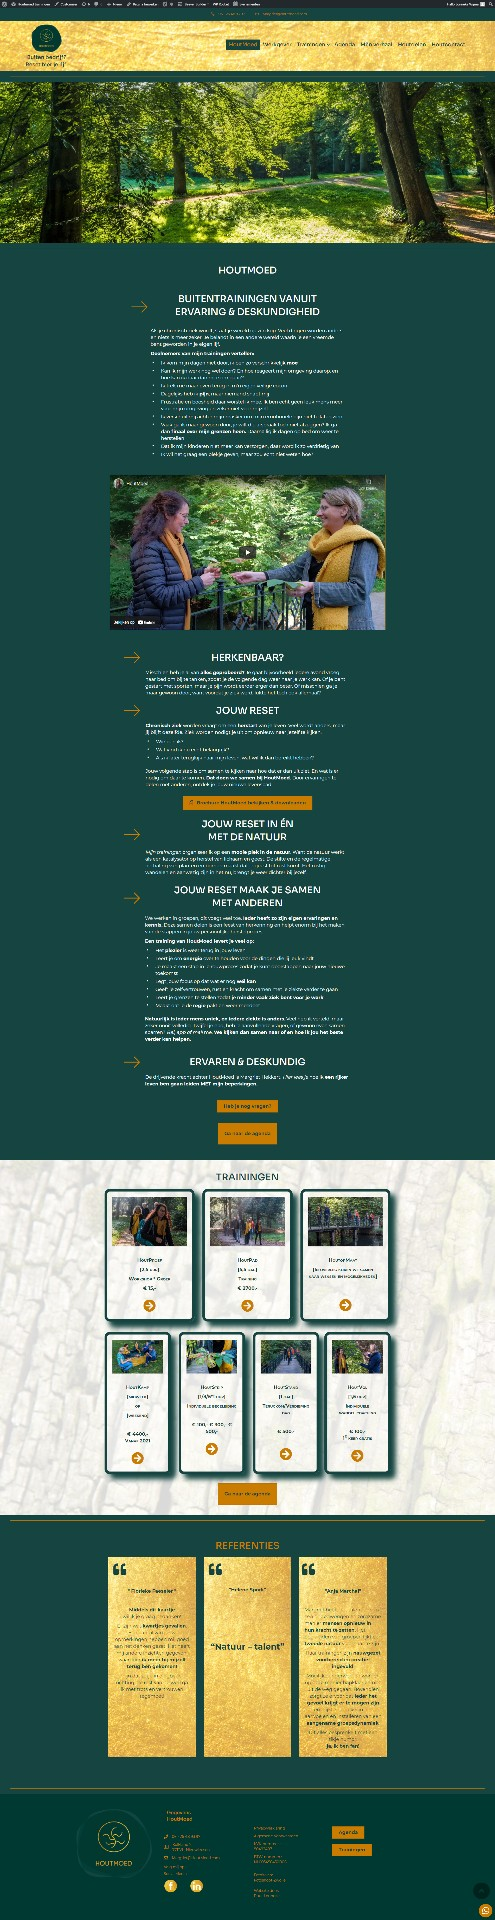 2021-03-23-15-03-houtmoed.com